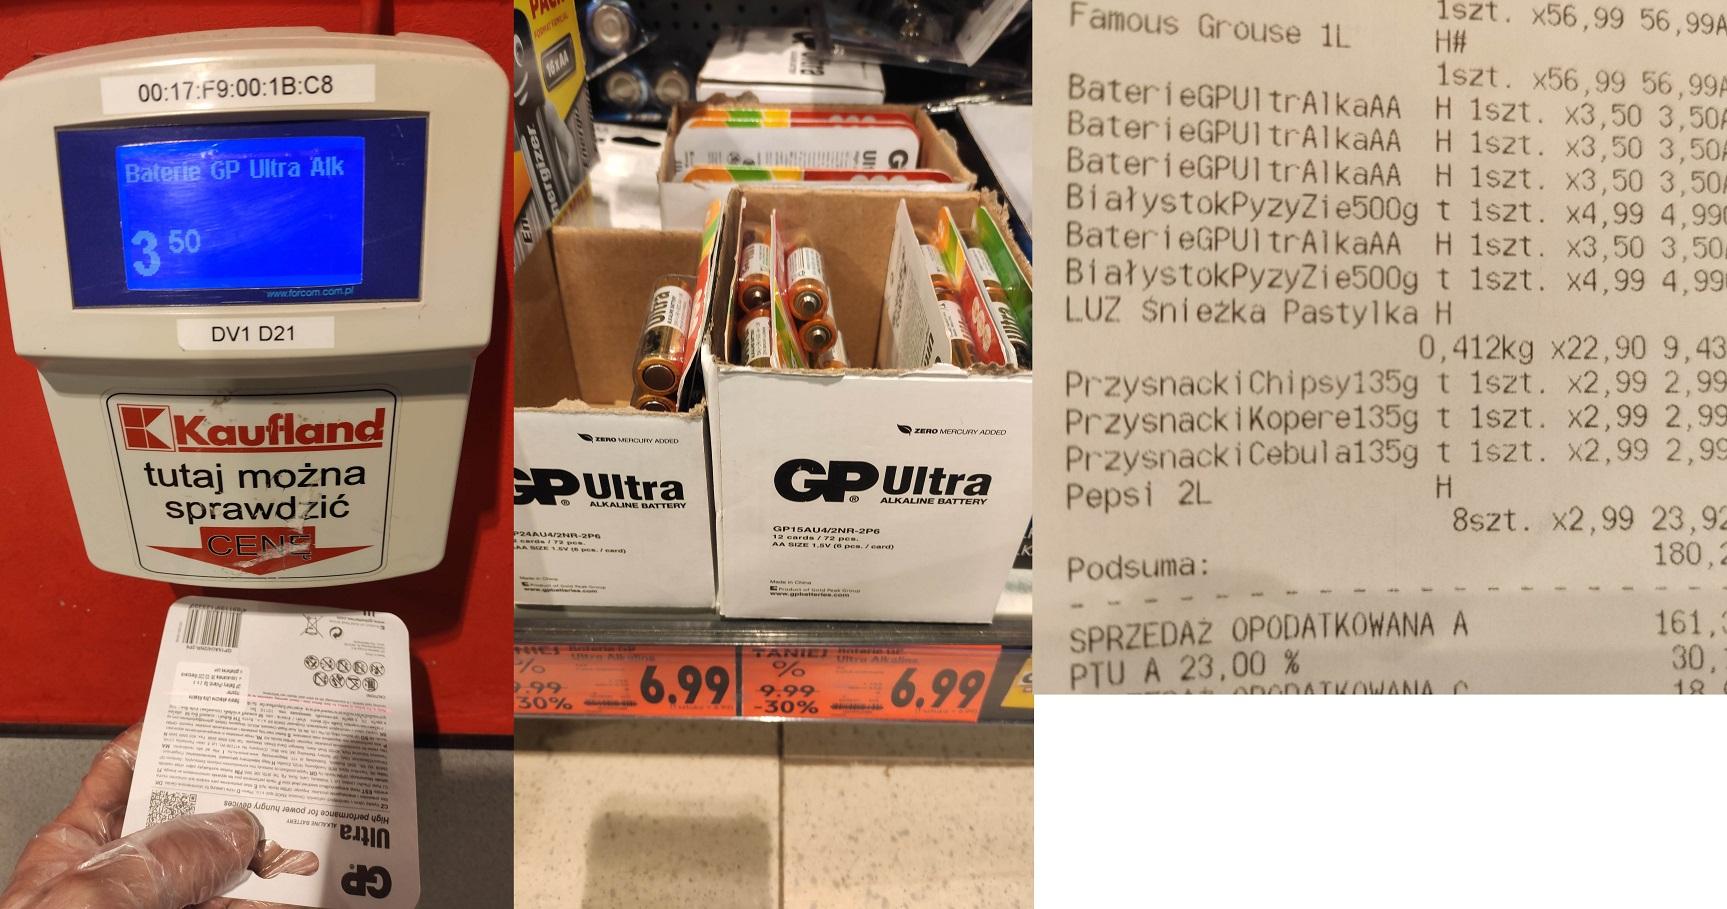 Baterie paluszki GP Ultra AA 6szt. Kaufland Opole